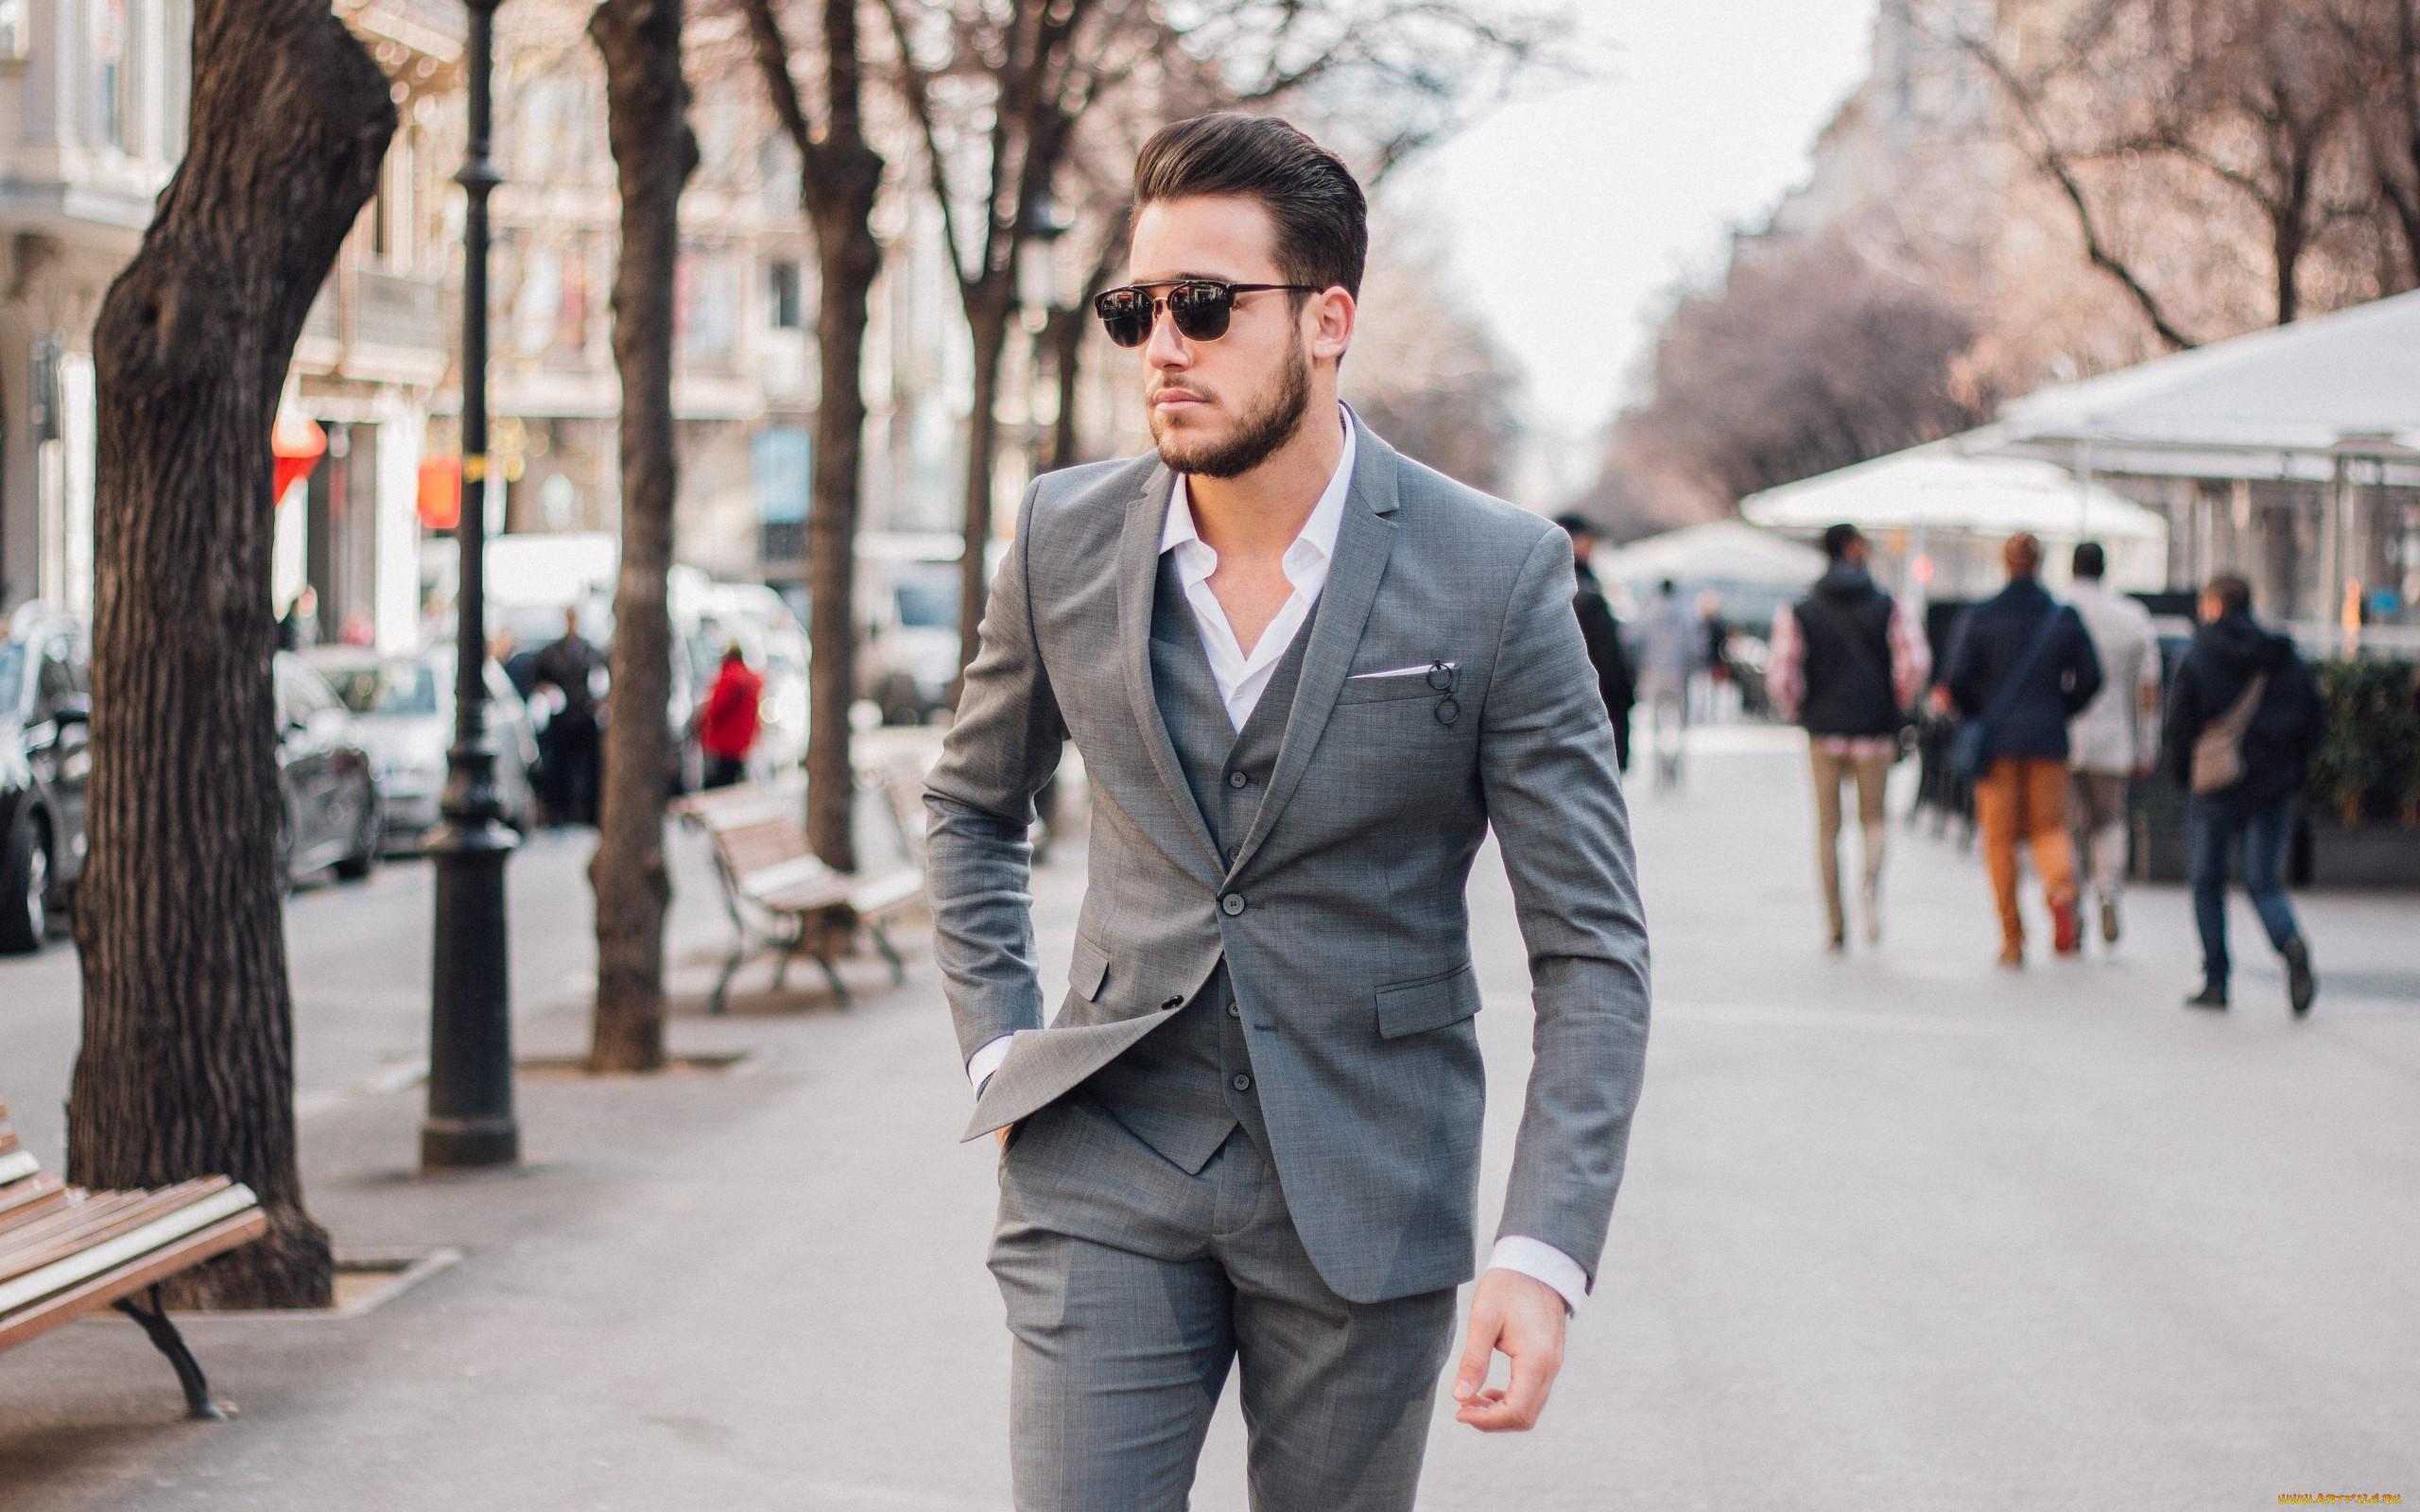 Картинка мужчина на улице